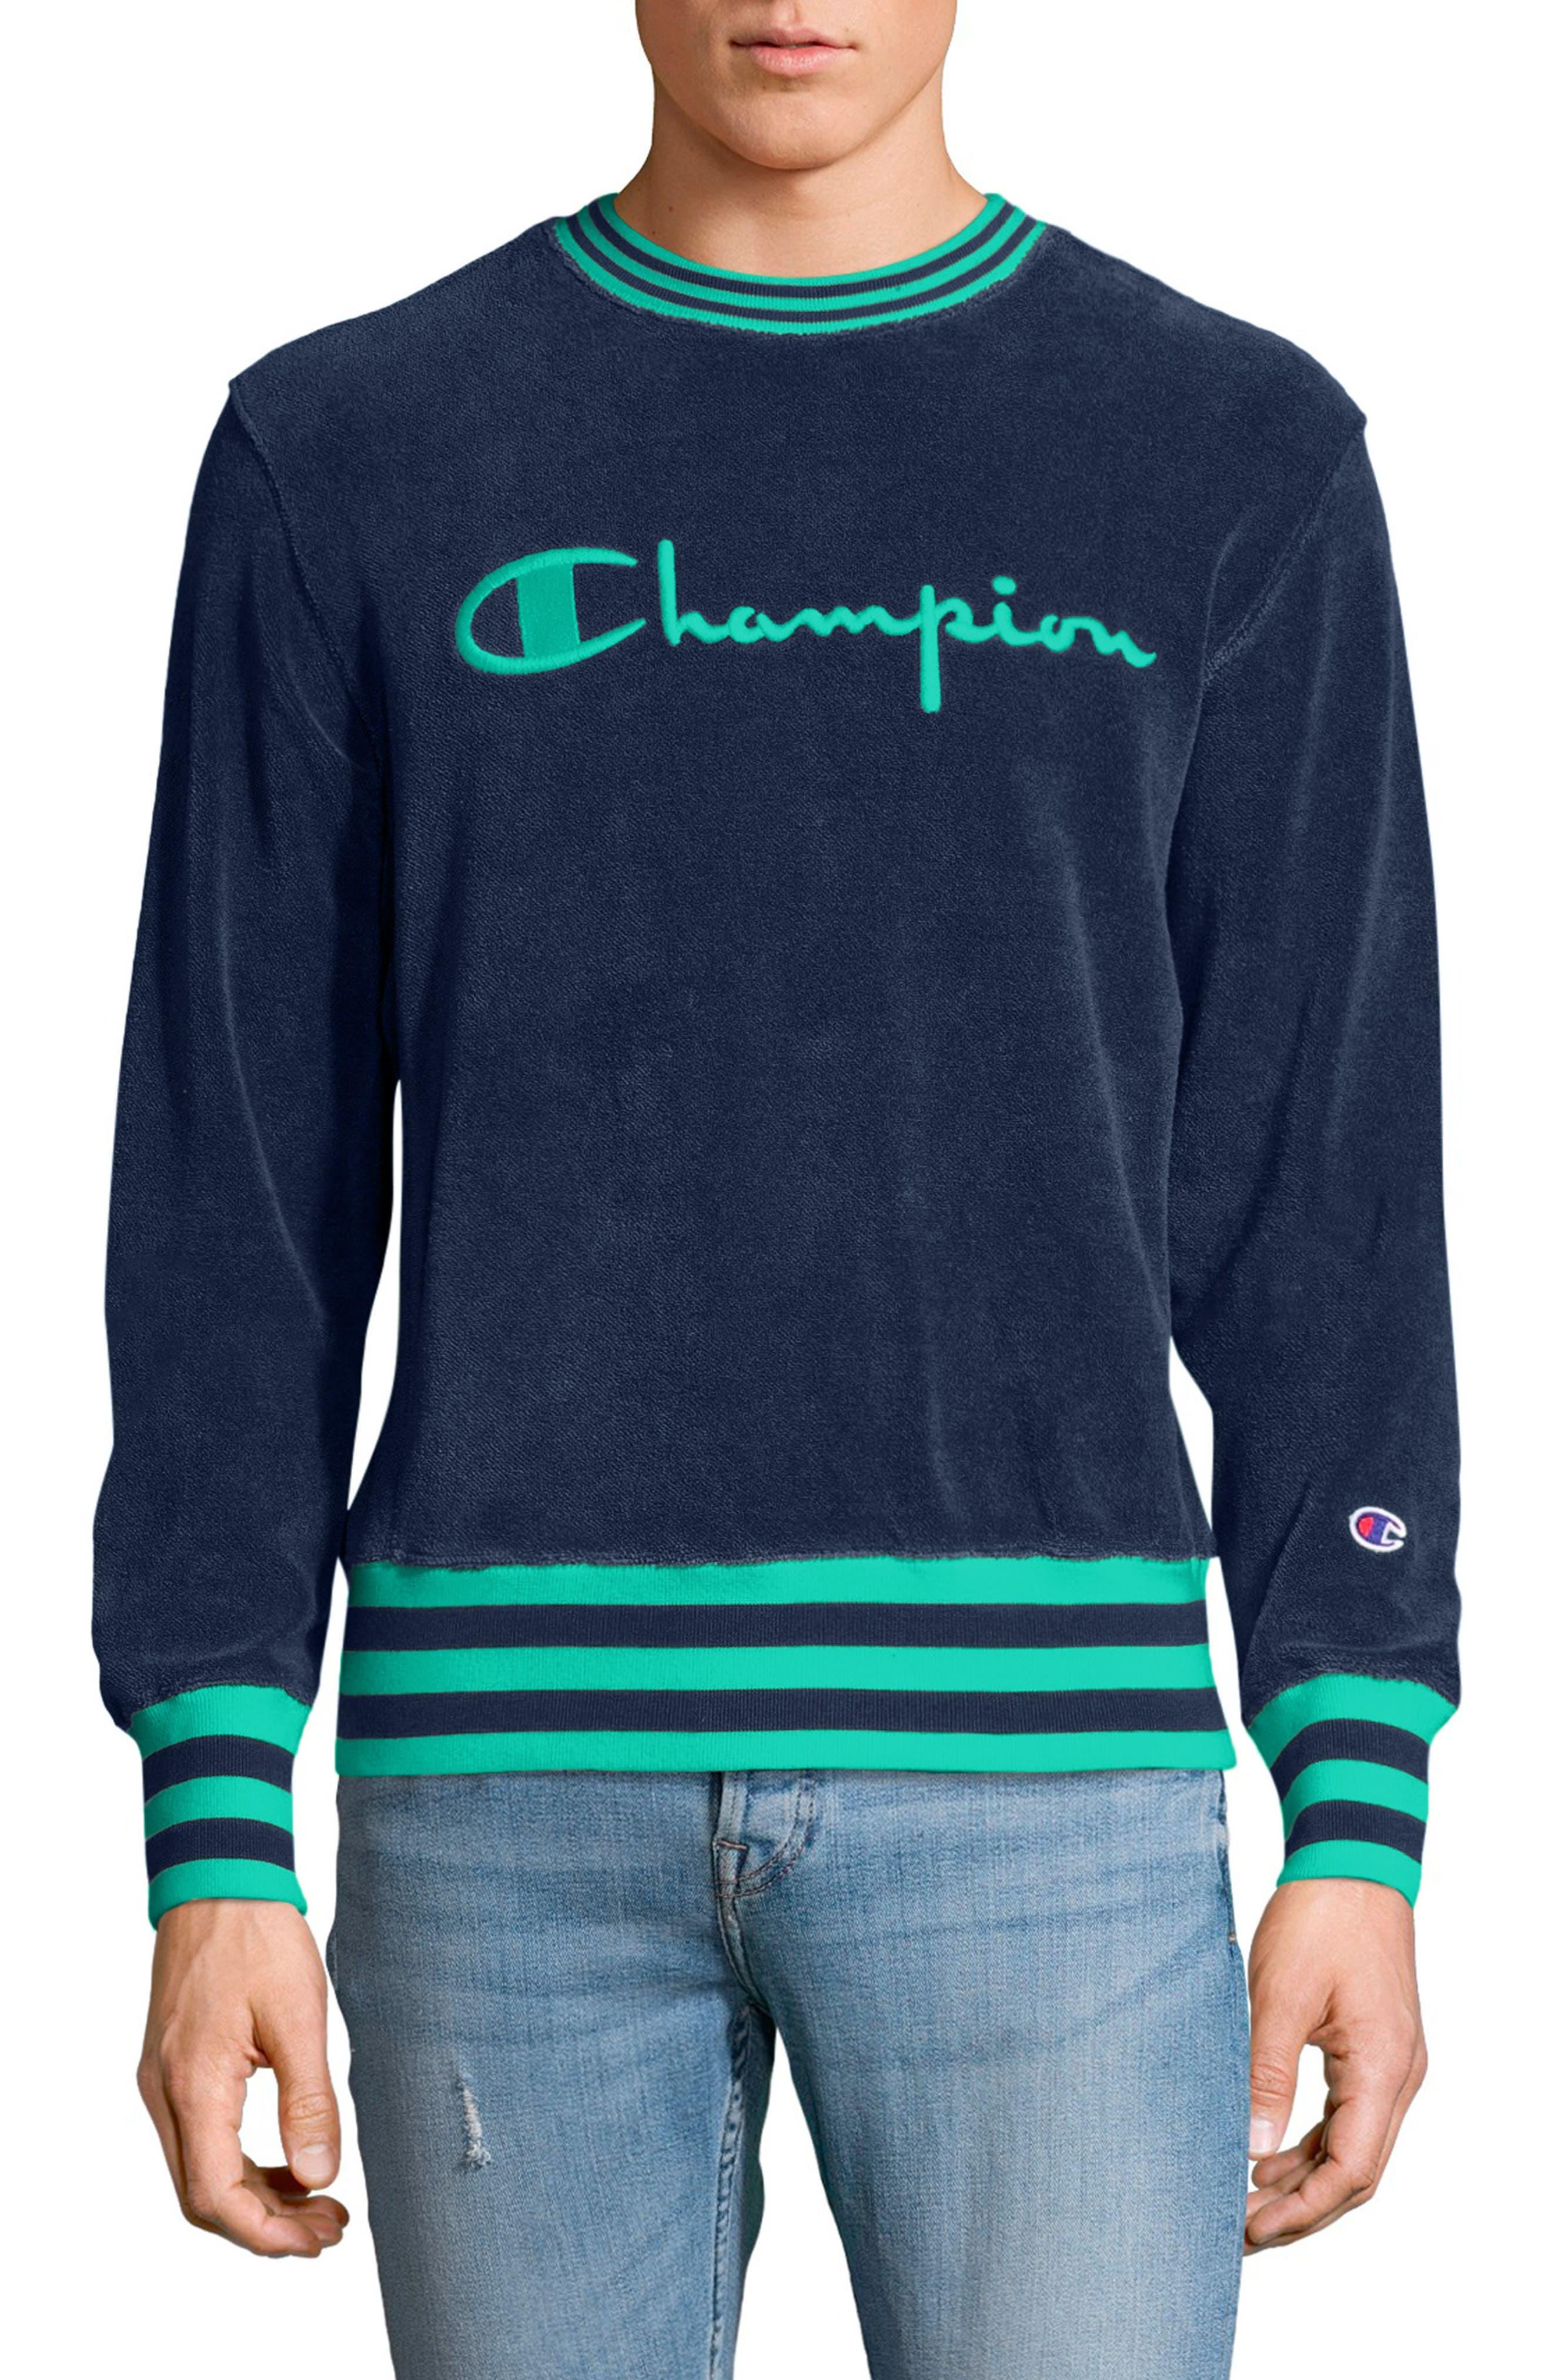 Sponge Terry Crewneck Sweatshirt,                         Main,                         color, Navy